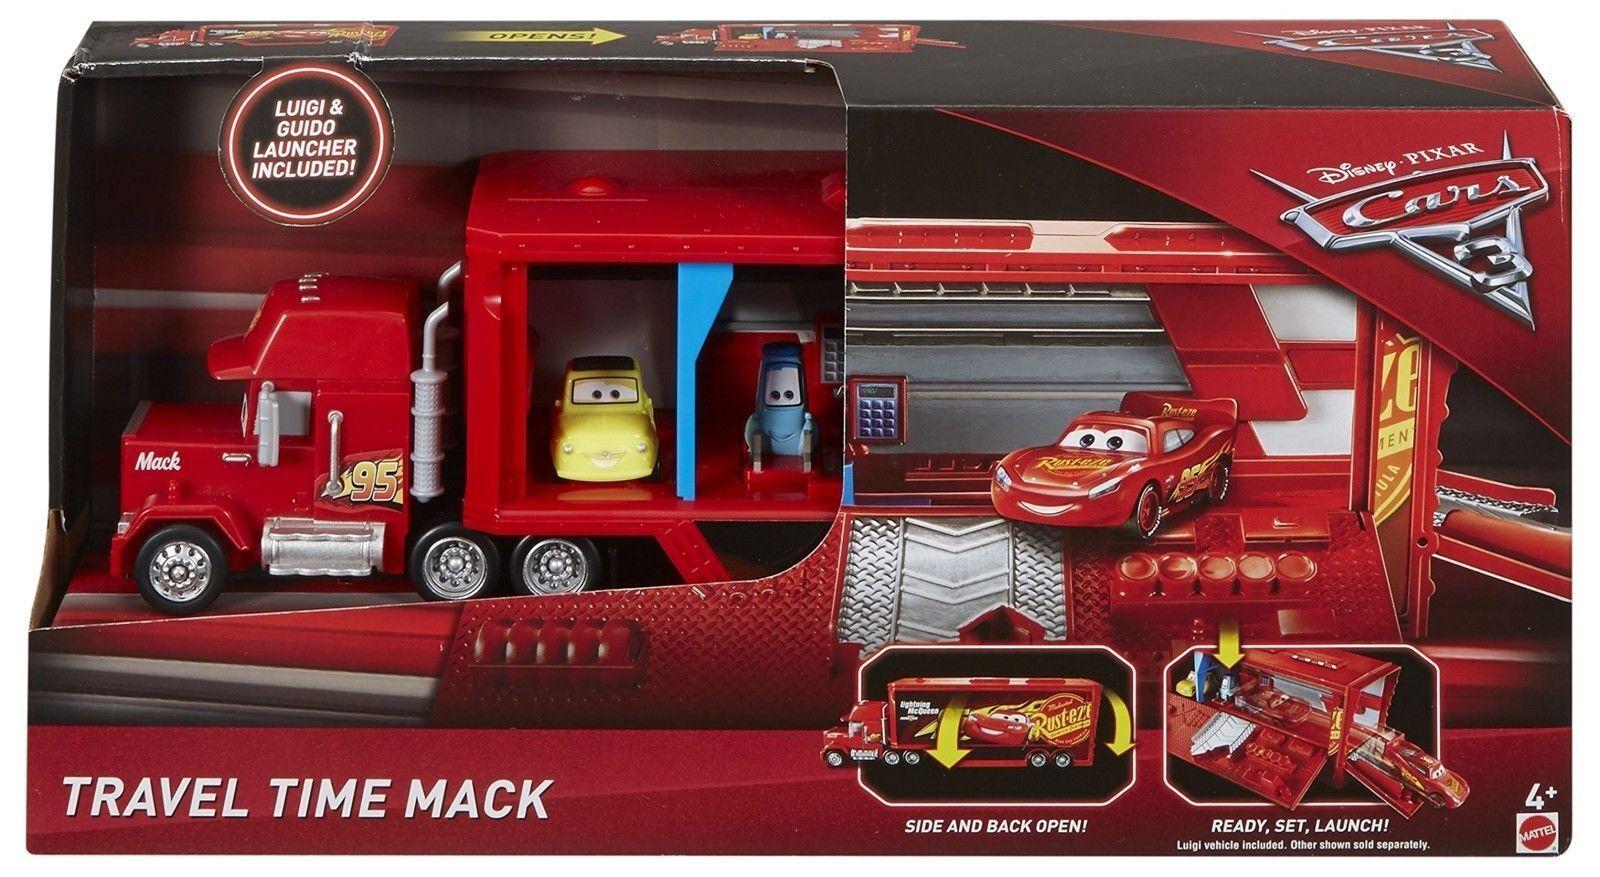 Disney Cars 3 Travel Time Mack Playset Pixar